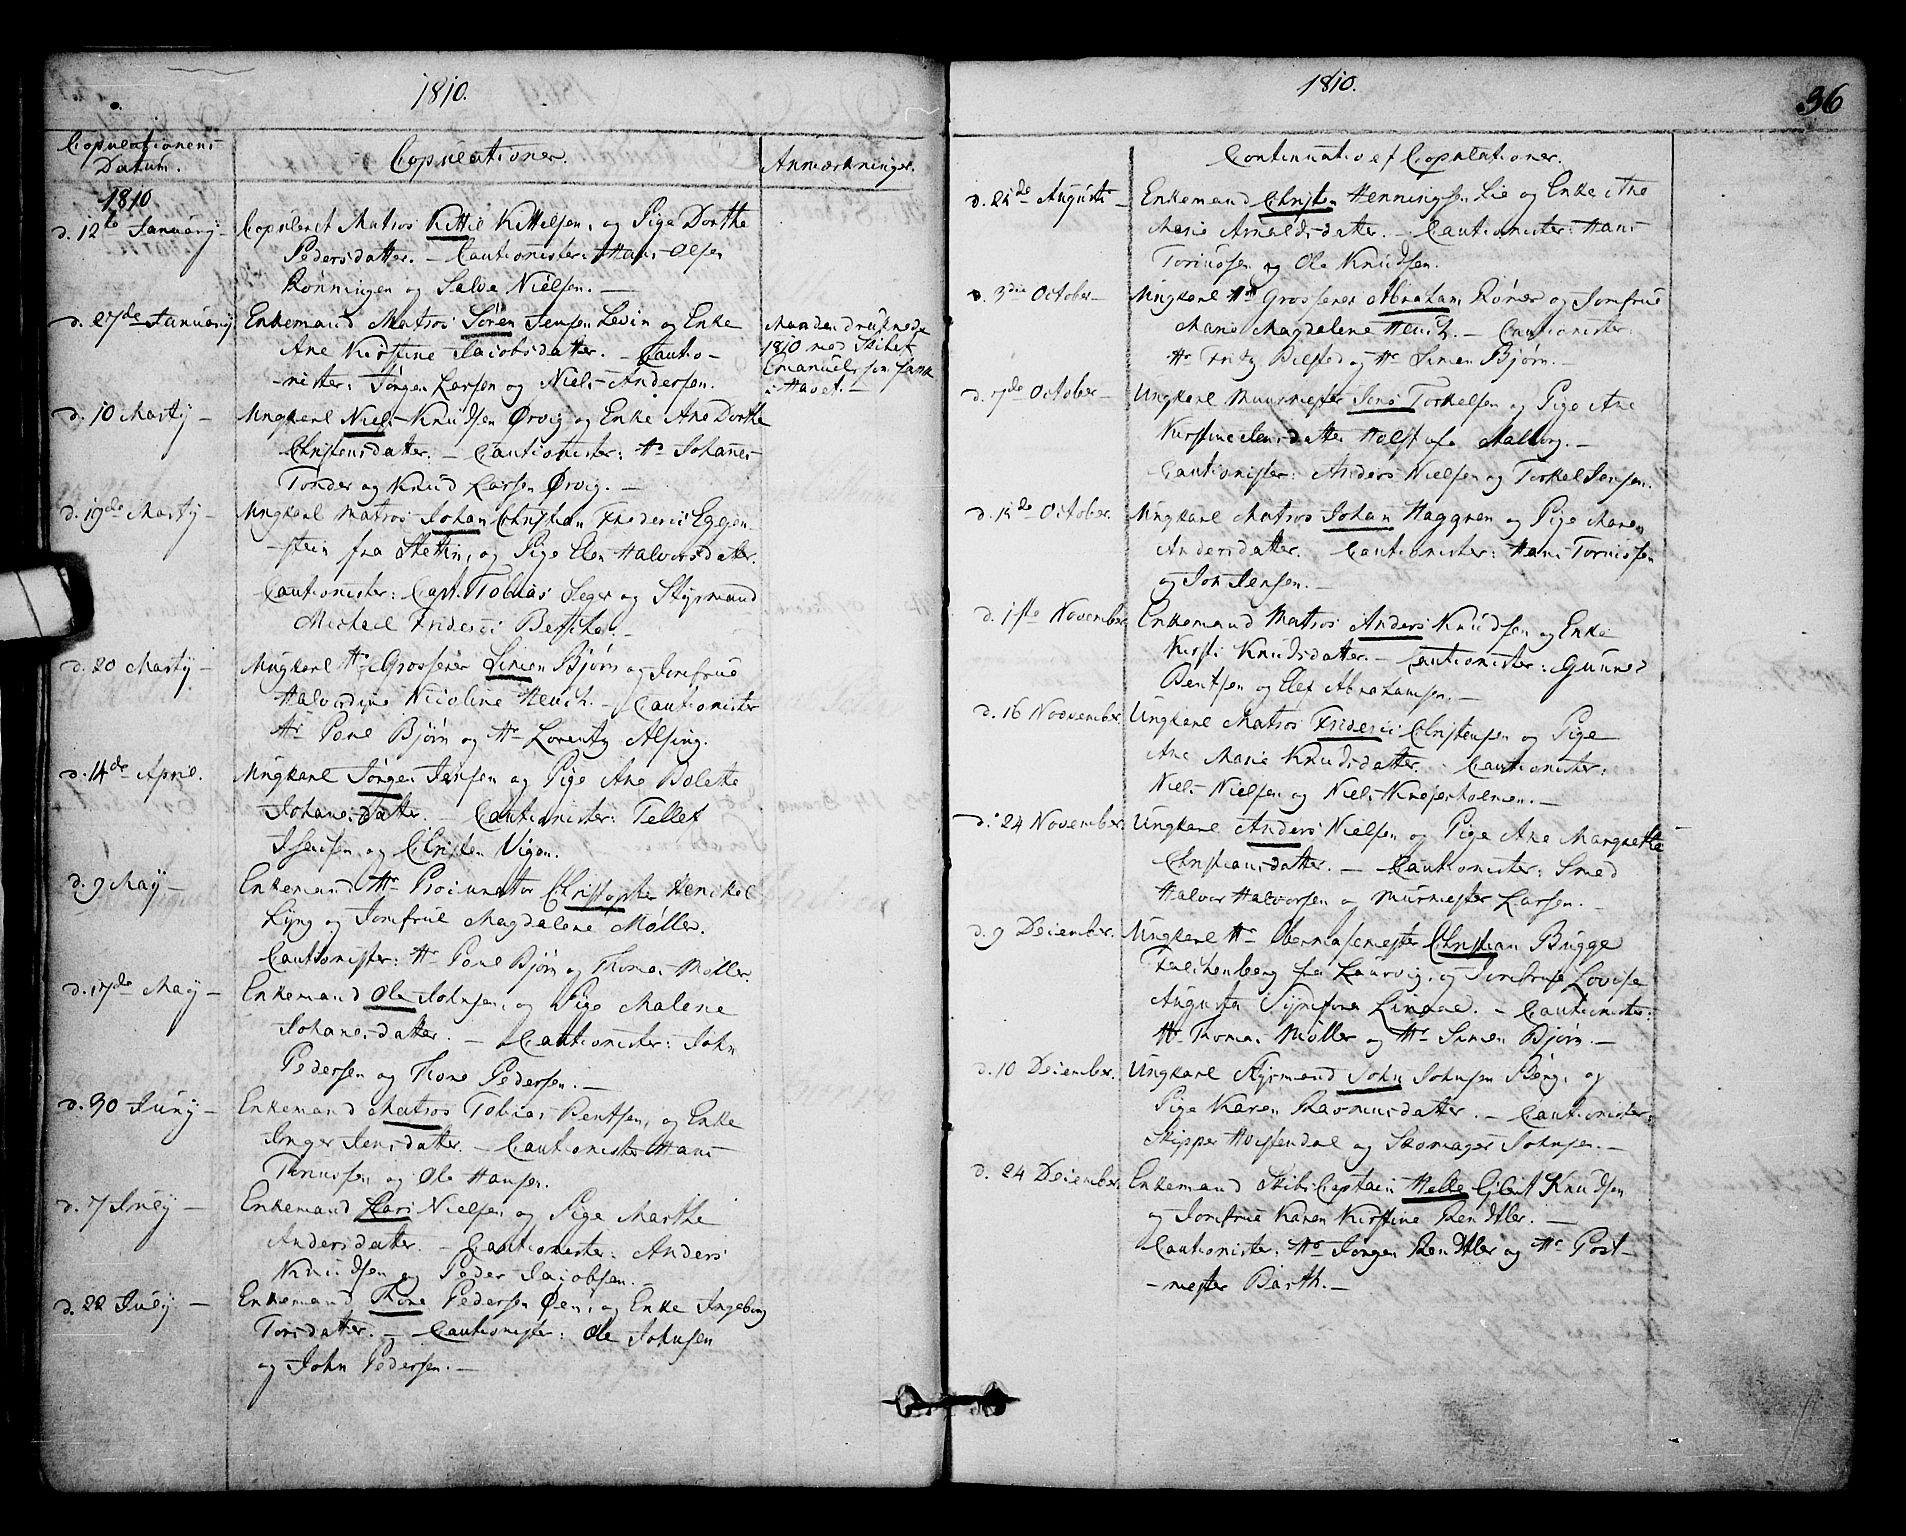 SAKO, Kragerø kirkebøker, F/Fa/L0003: Ministerialbok nr. 3, 1802-1813, s. 36